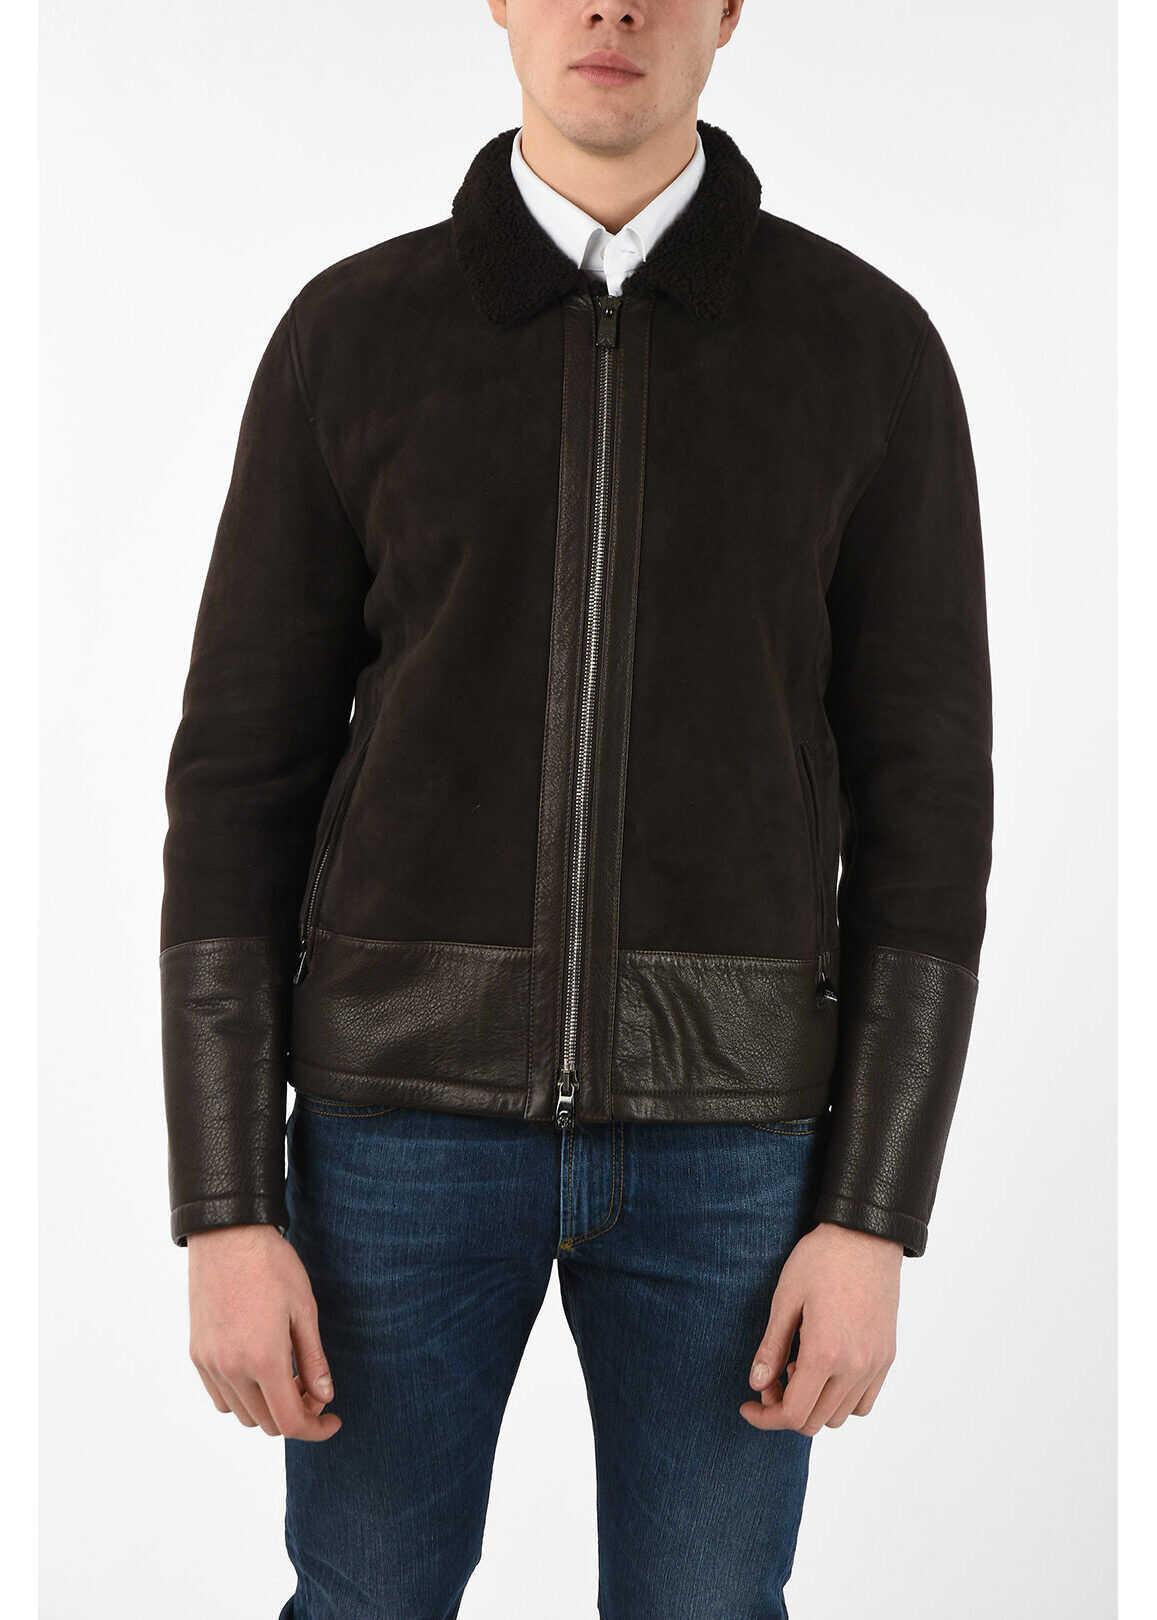 CORNELIANI ID full zip suede leather outerwear jacket BROWN imagine